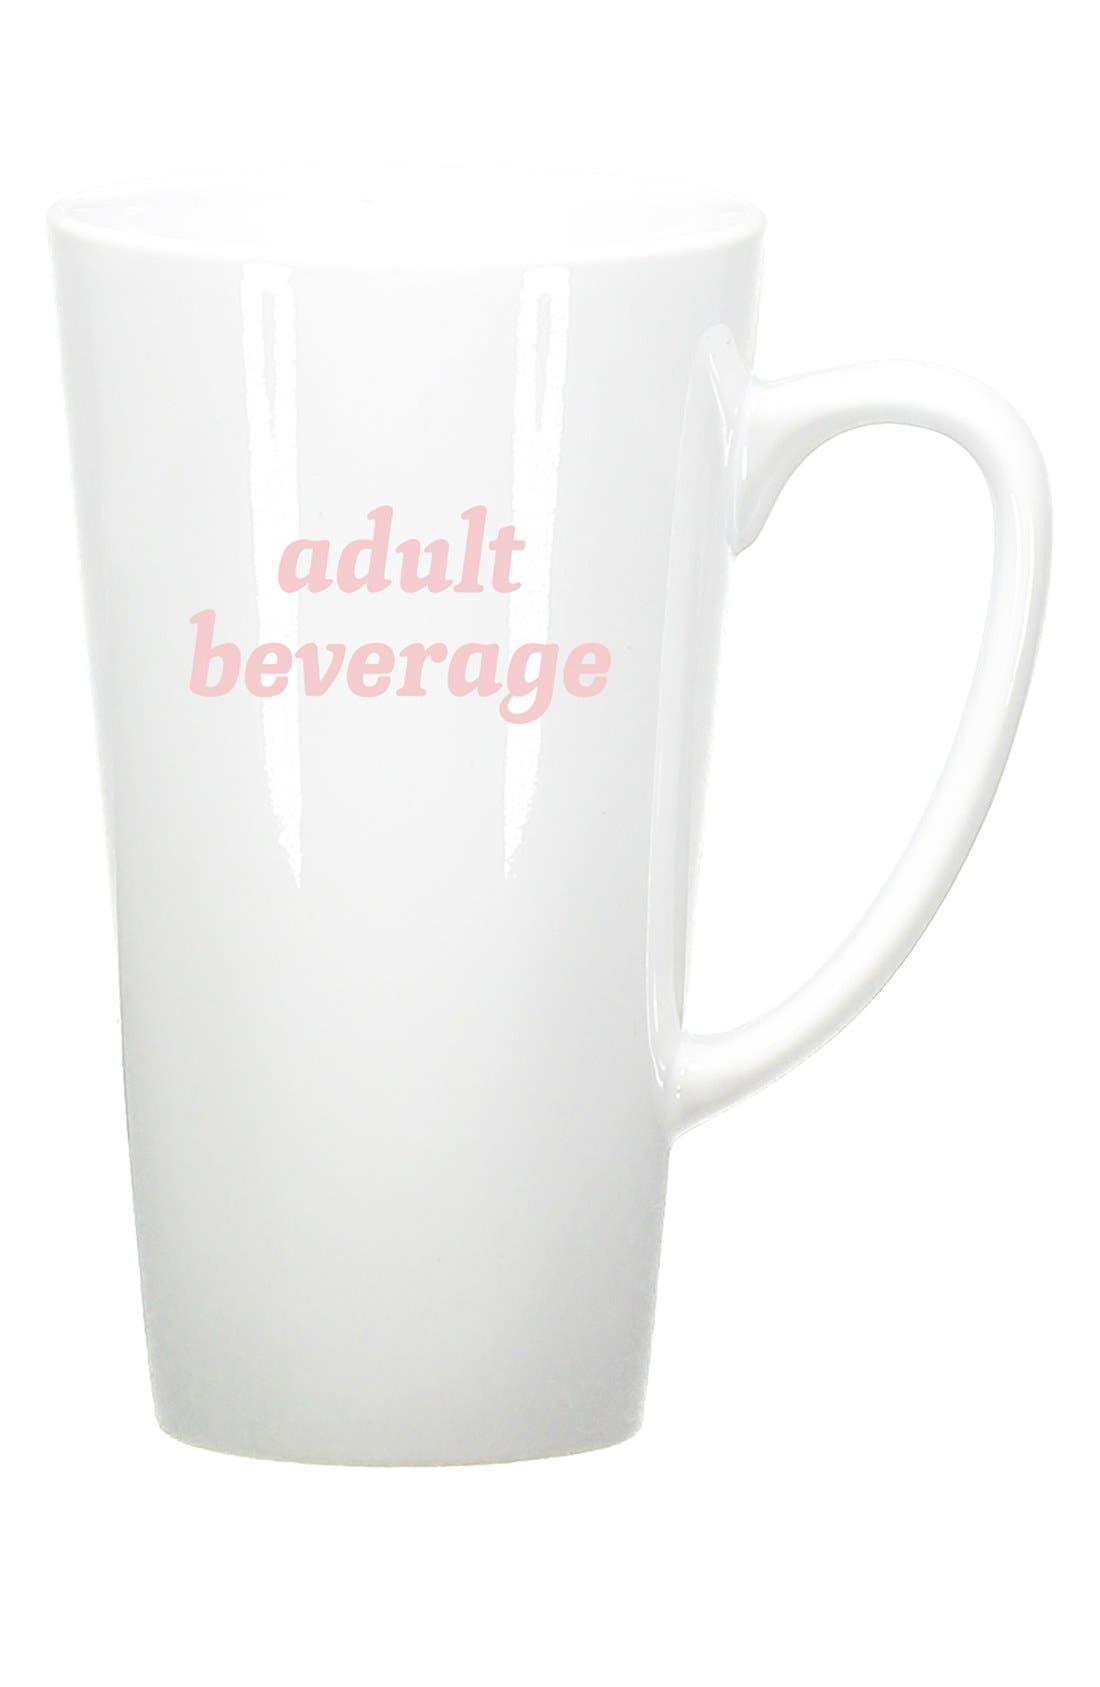 Alternate Image 1 Selected - Bow & Drape 'Adult Beverage' Ceramic Mug